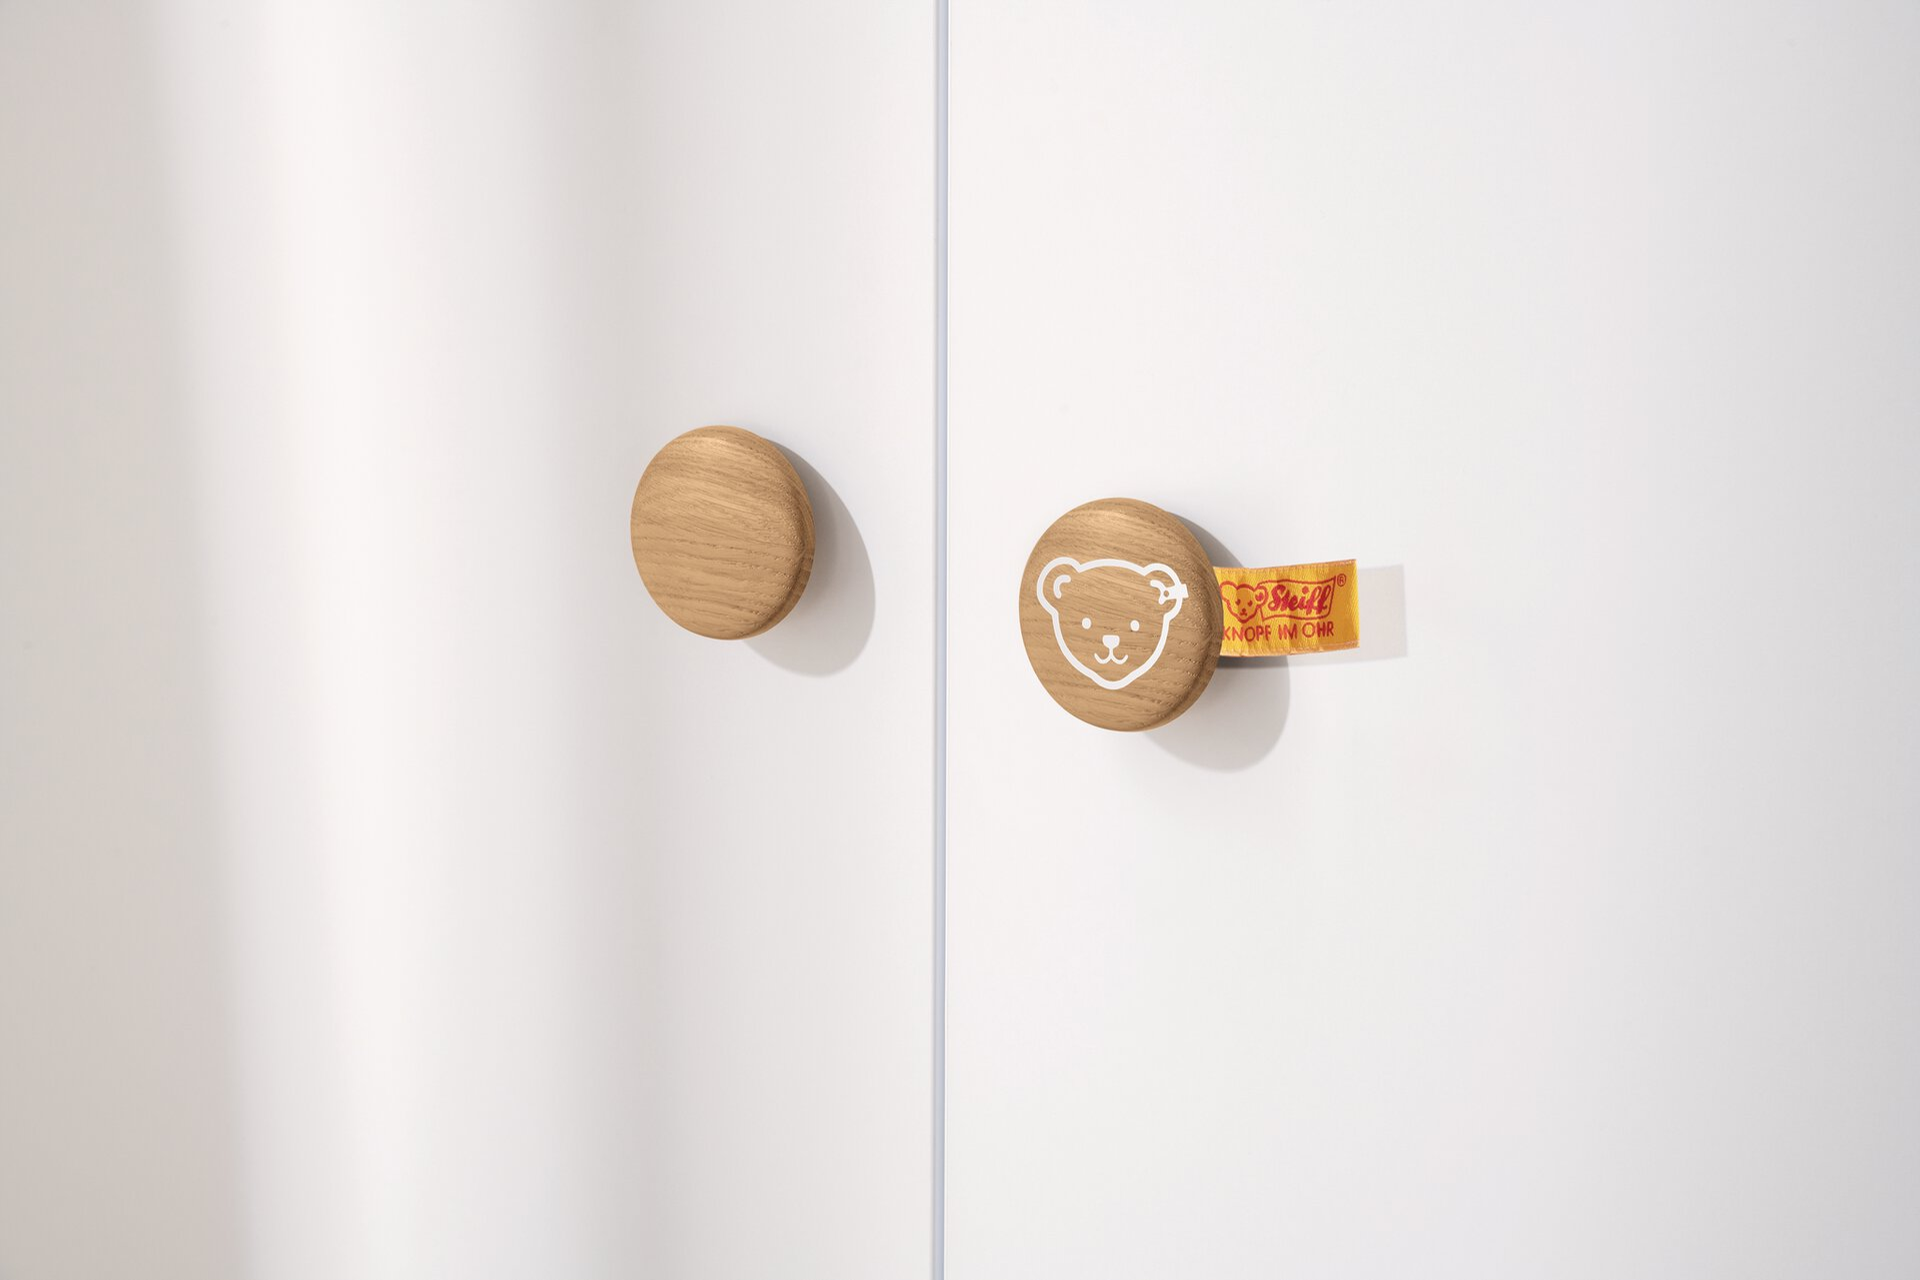 Kinderschrank LOTTE & FYNN PAIDI Holzwerkstoff braun 57 x 202 x 119 cm